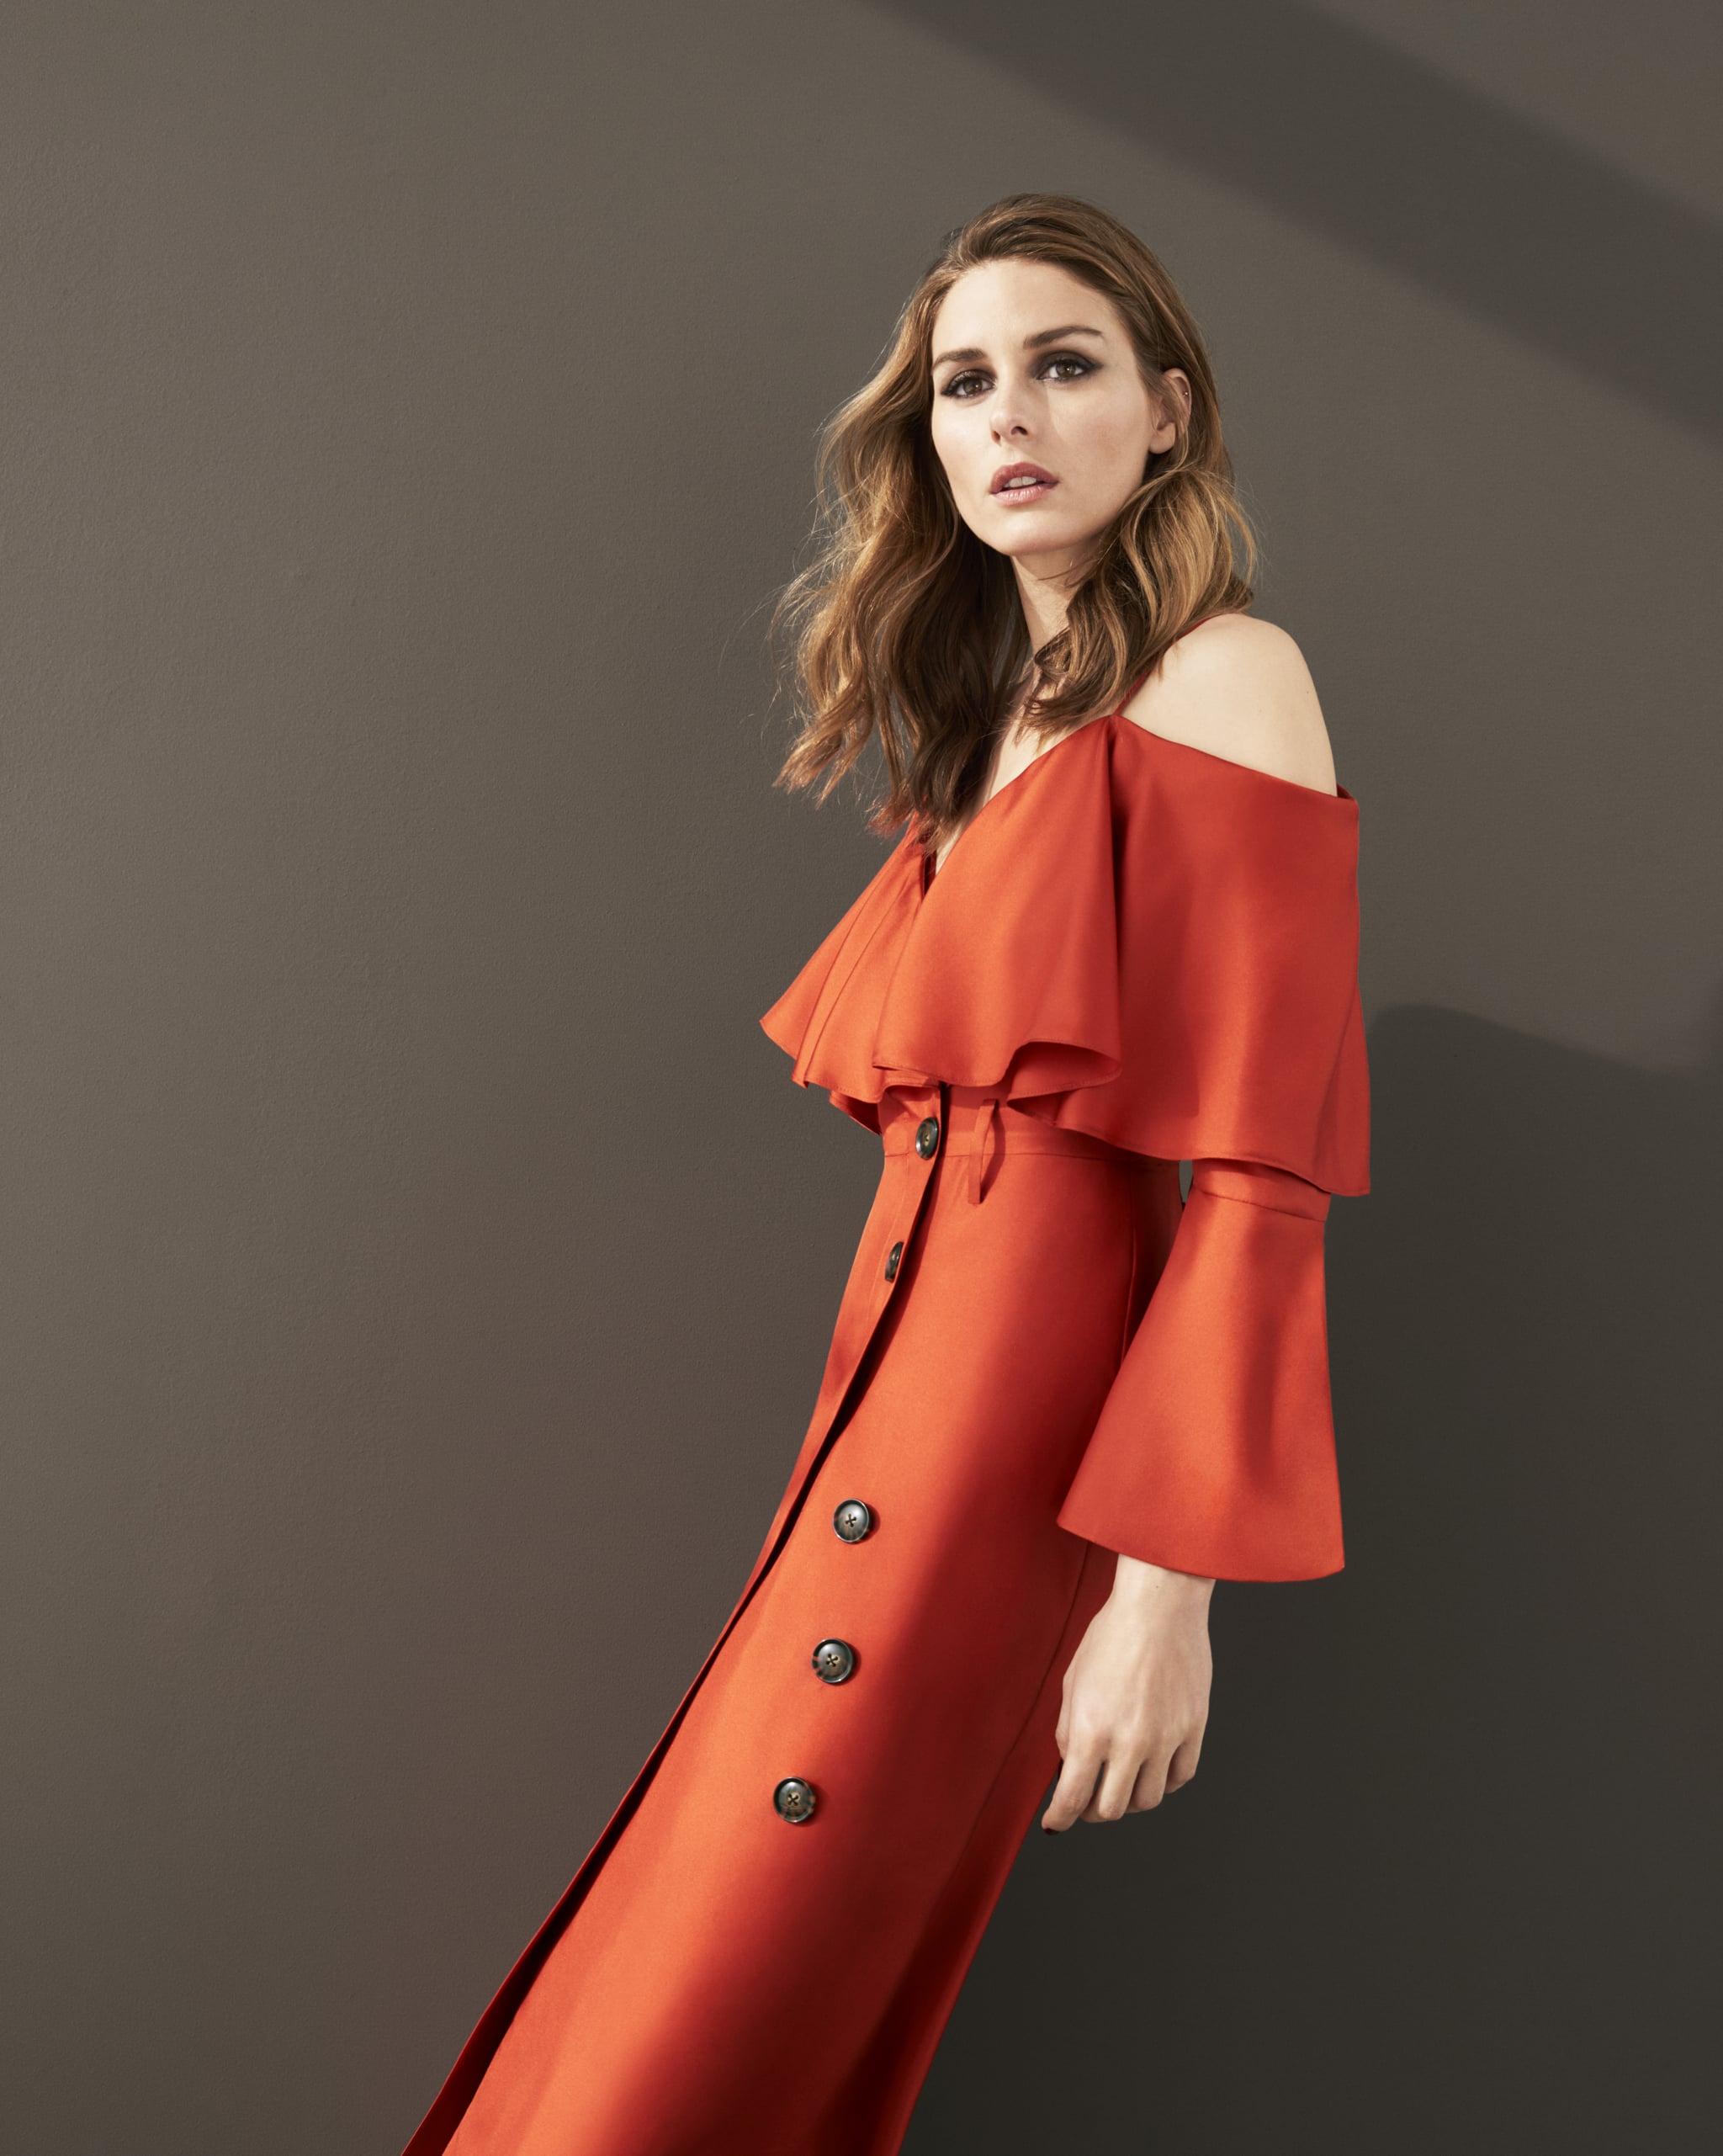 6c3c8786532d Banana Republic x Olivia Palermo Long-Sleeve Ruffle Off-the-Shoulder Midi  Dress